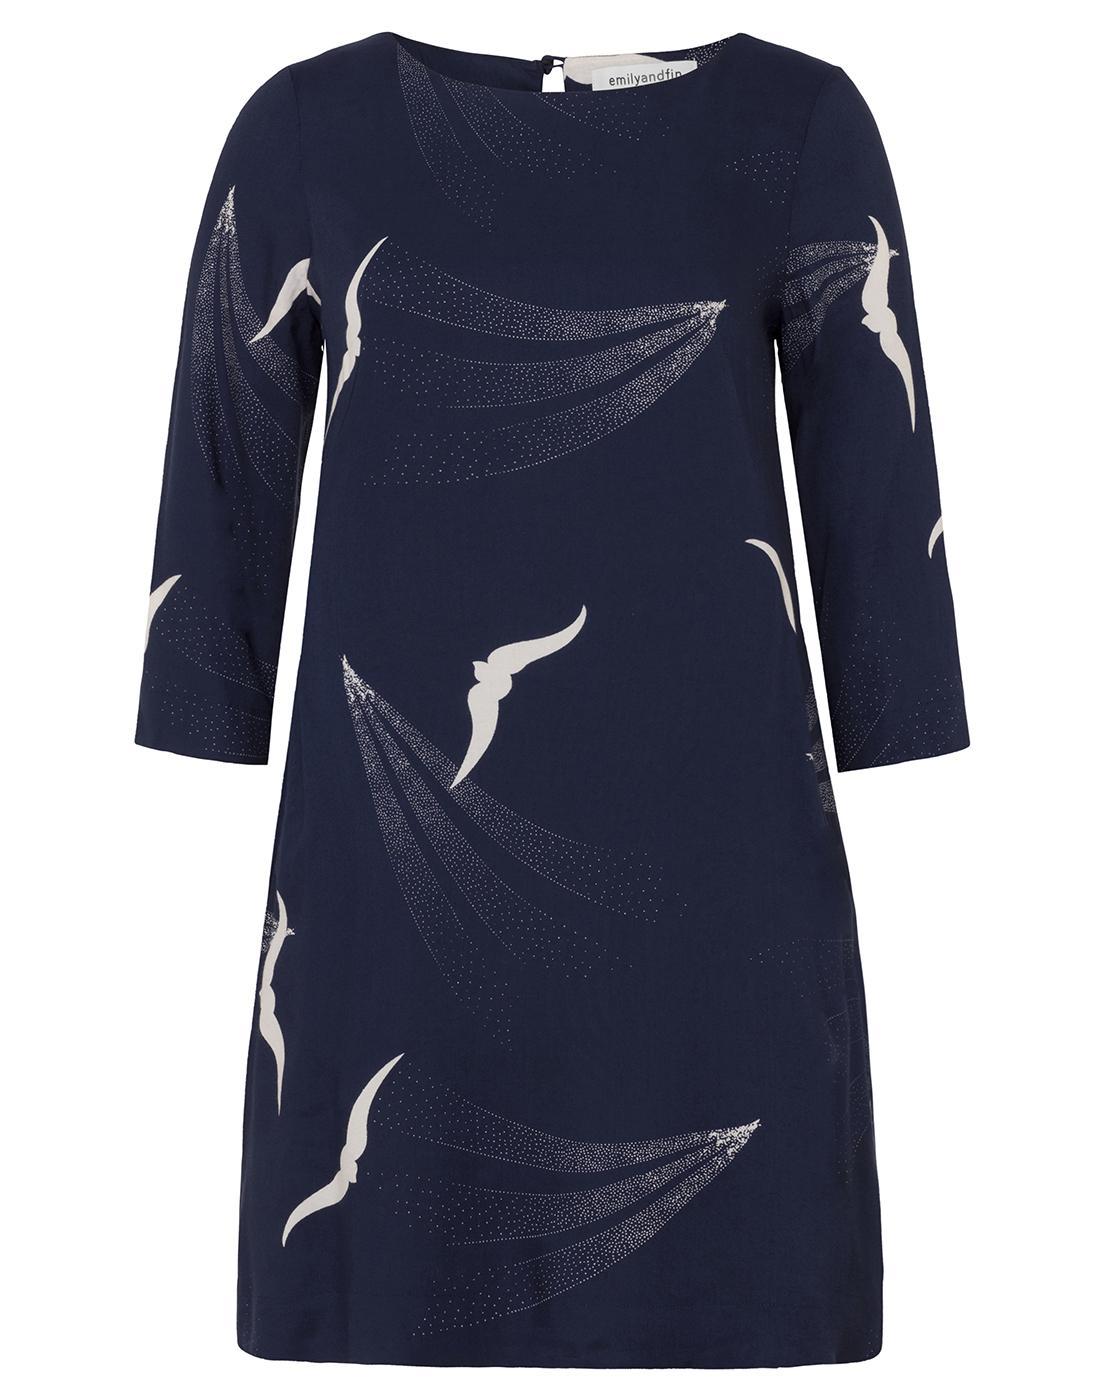 Effy EMILY AND FIN Retro Skyline Birds Tunic Dress